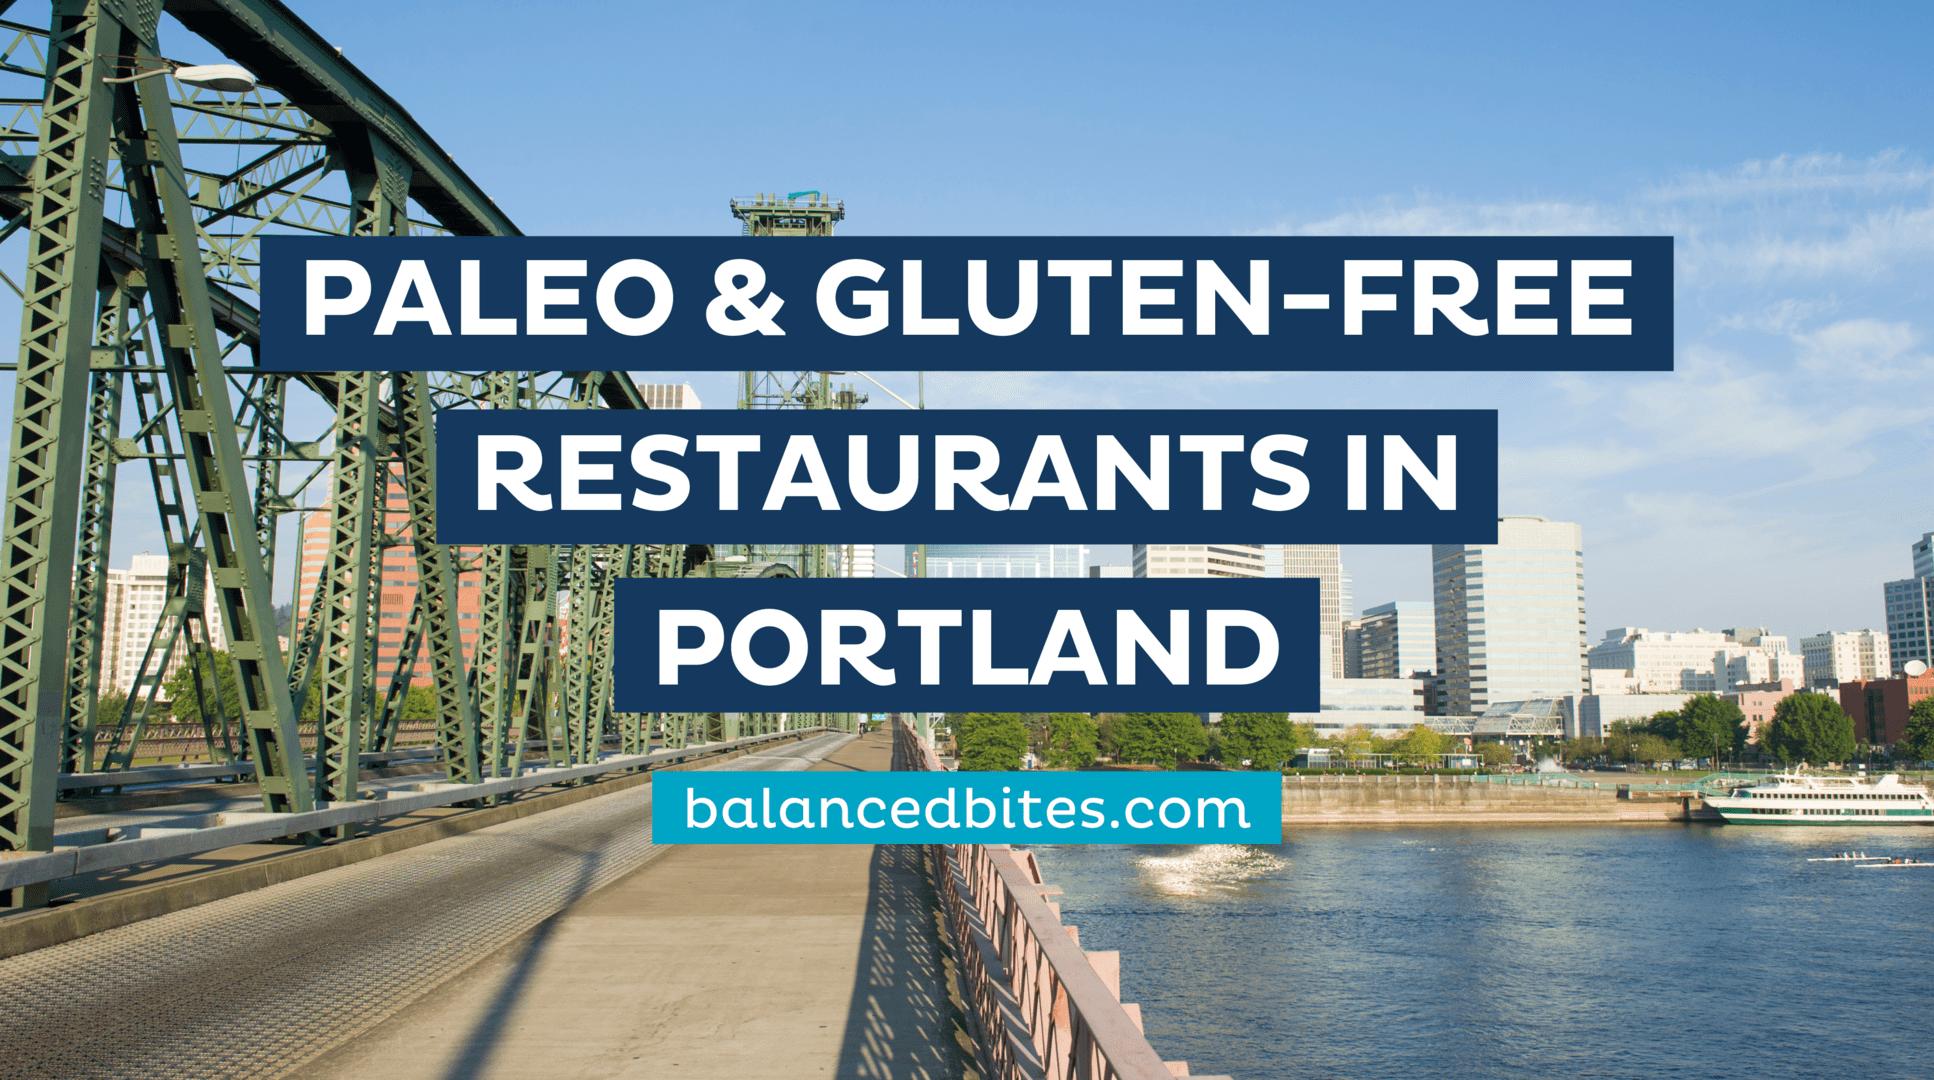 Paleo and Gluten-Free Restaurants   Portland   Balanced Bites